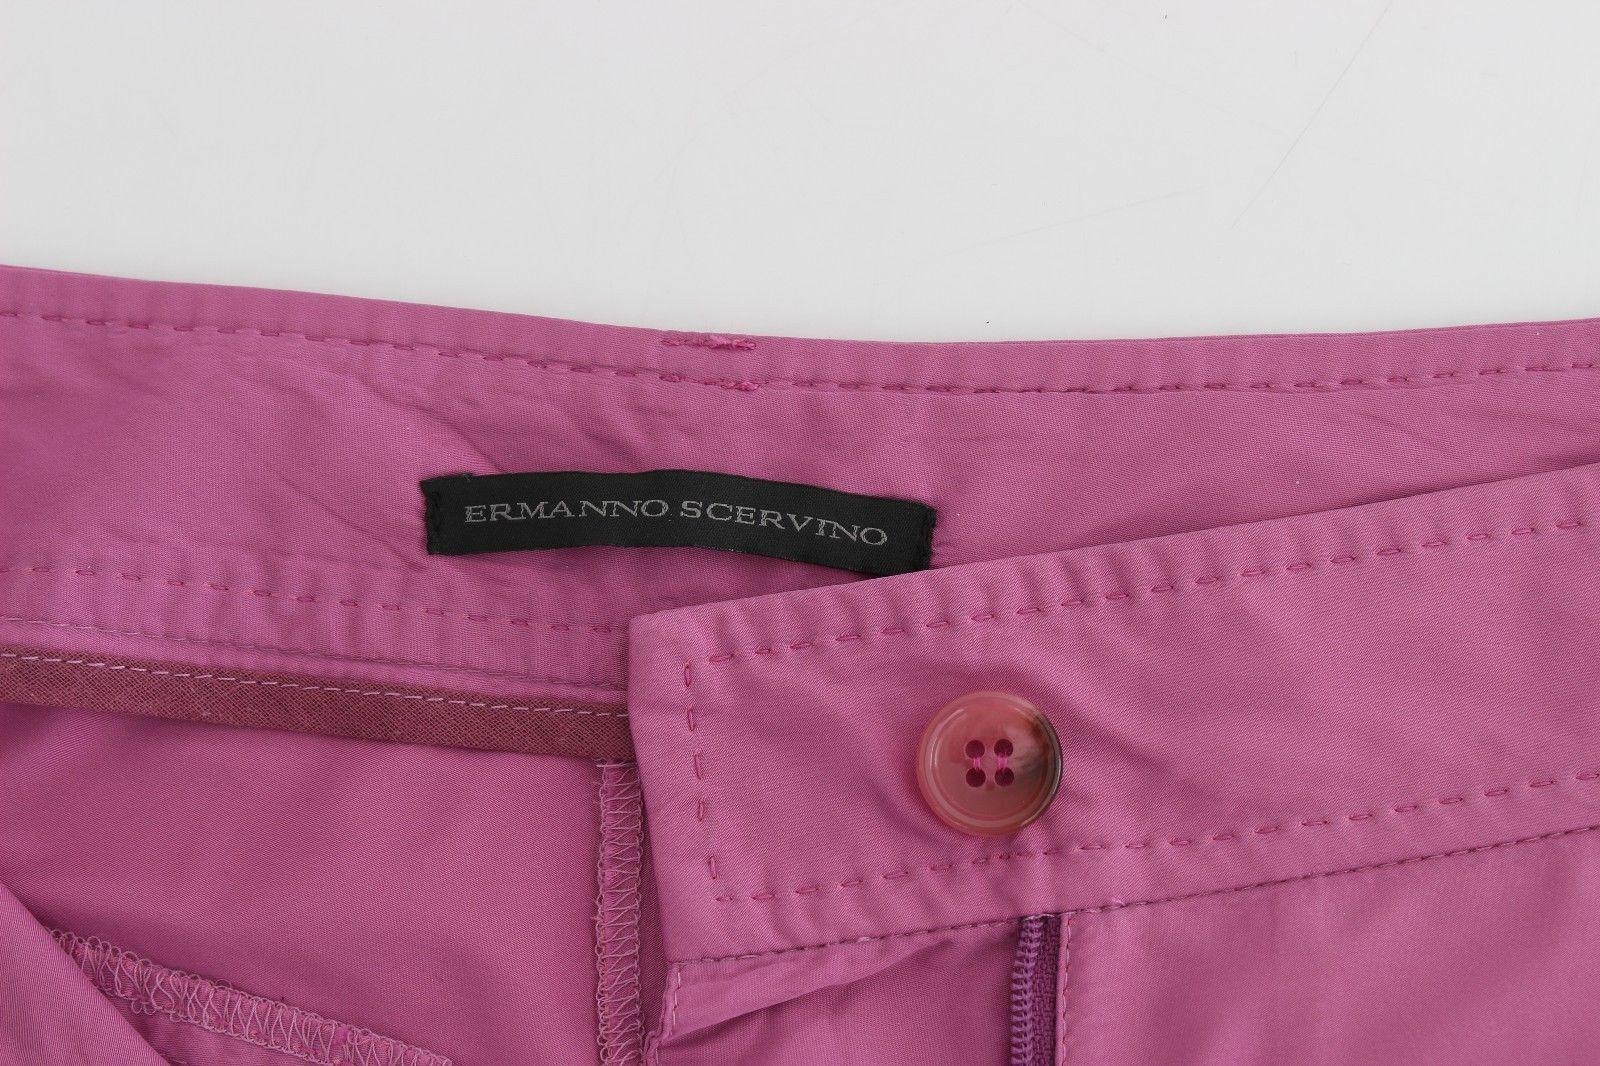 Ermanno Scervino Purple Chinos Casual Dress Pants Khakis